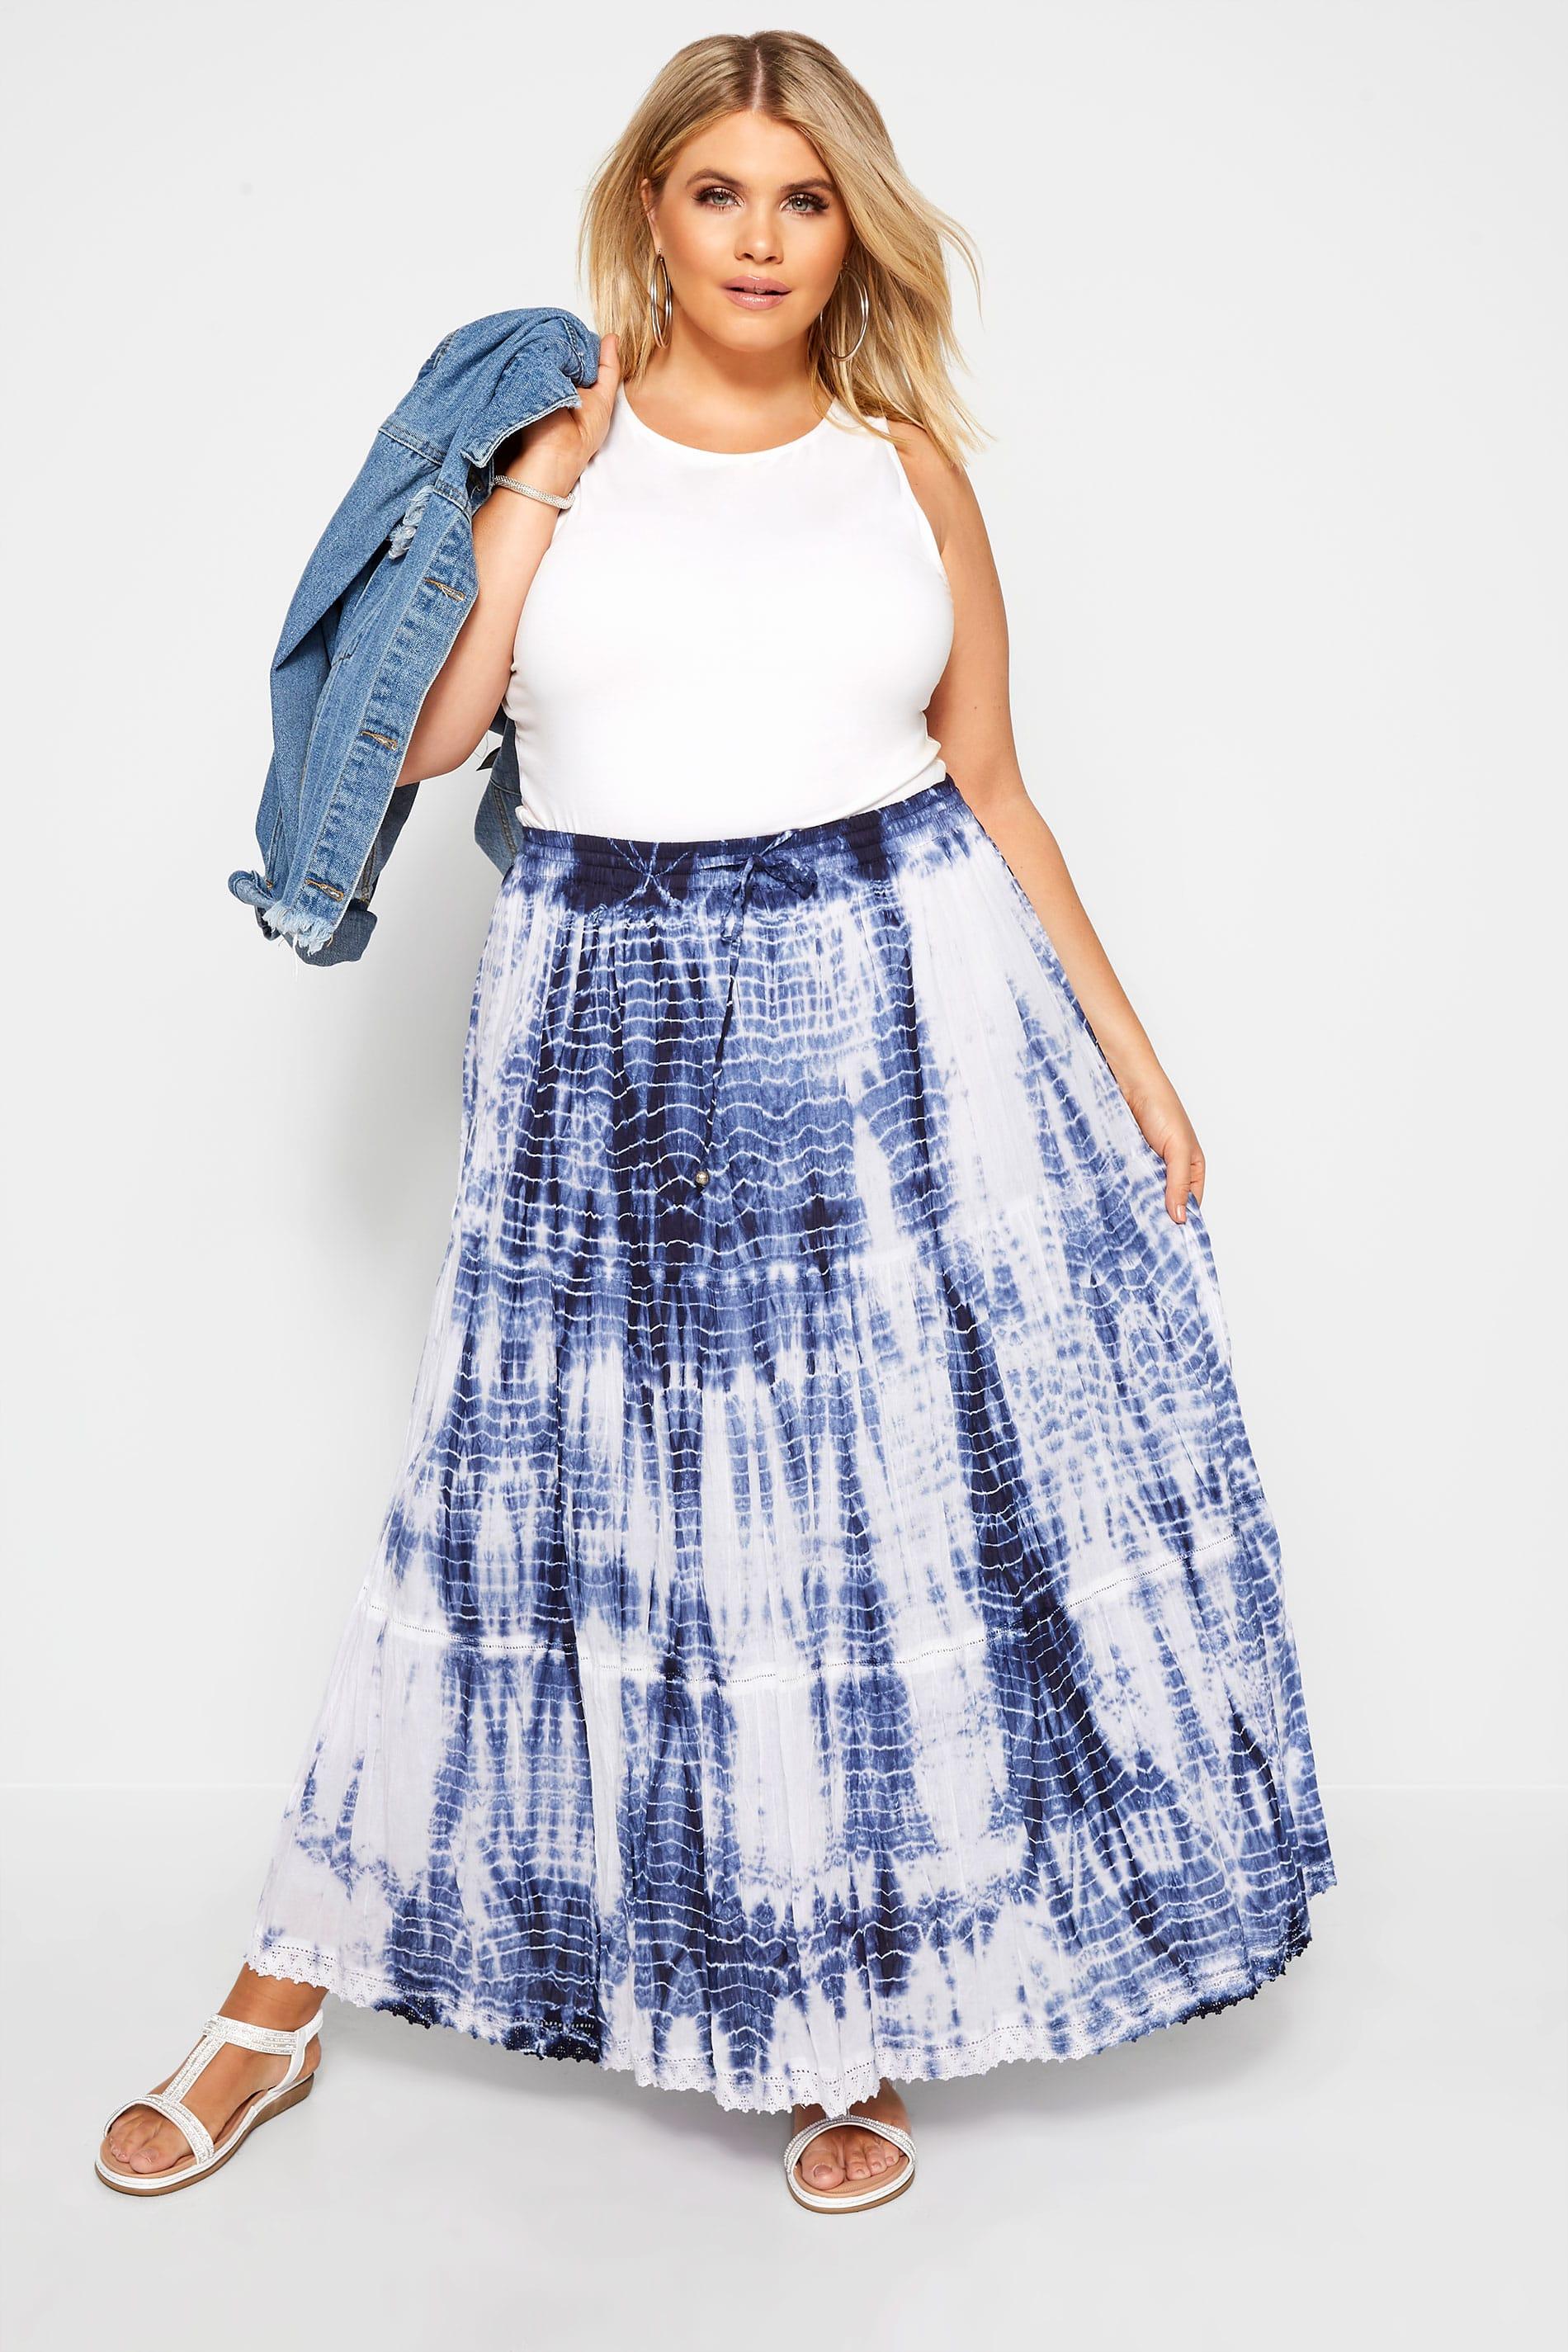 Blue Tie Dye Maxi Skirt